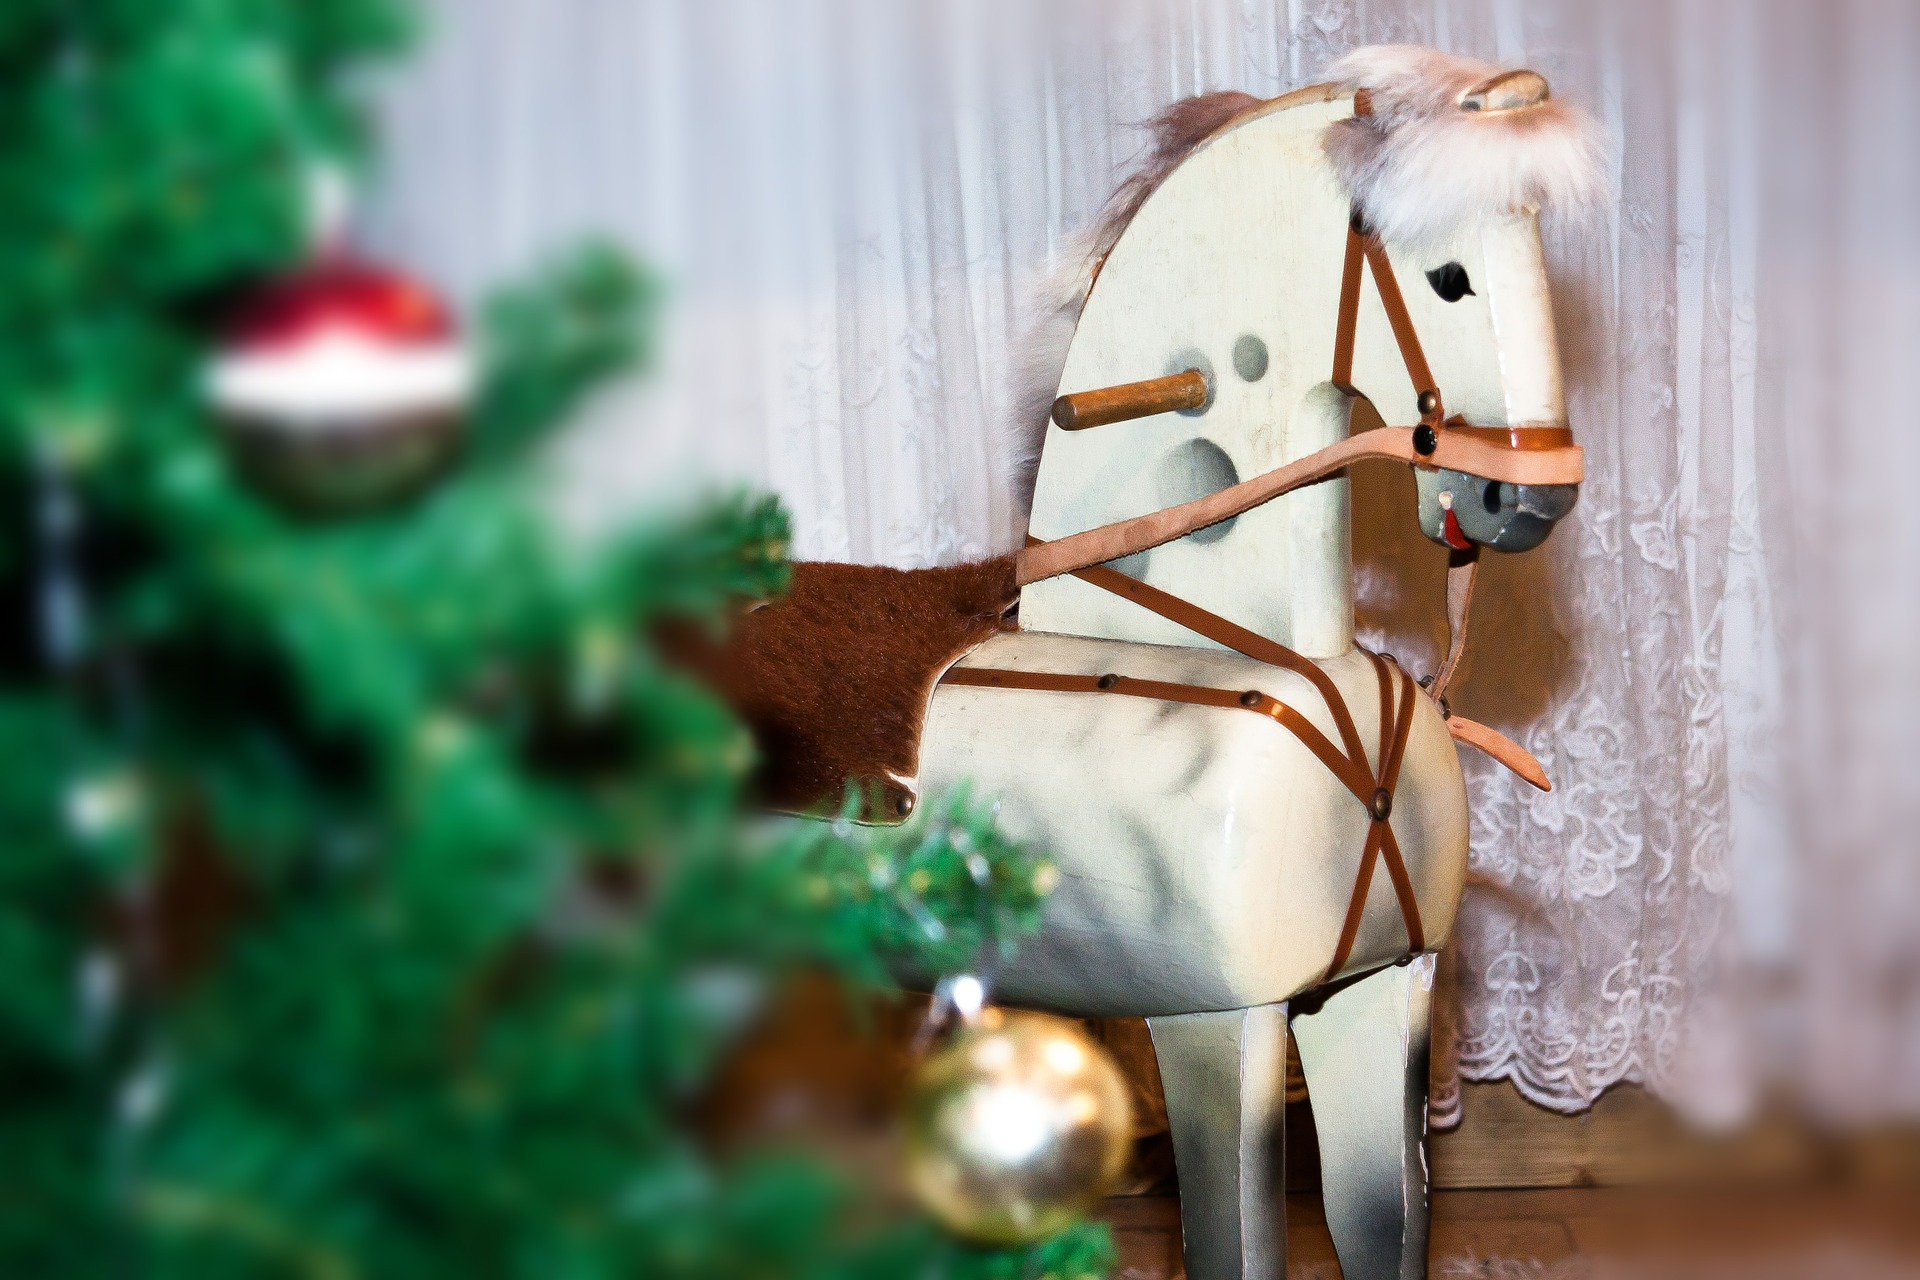 Horse figure photo